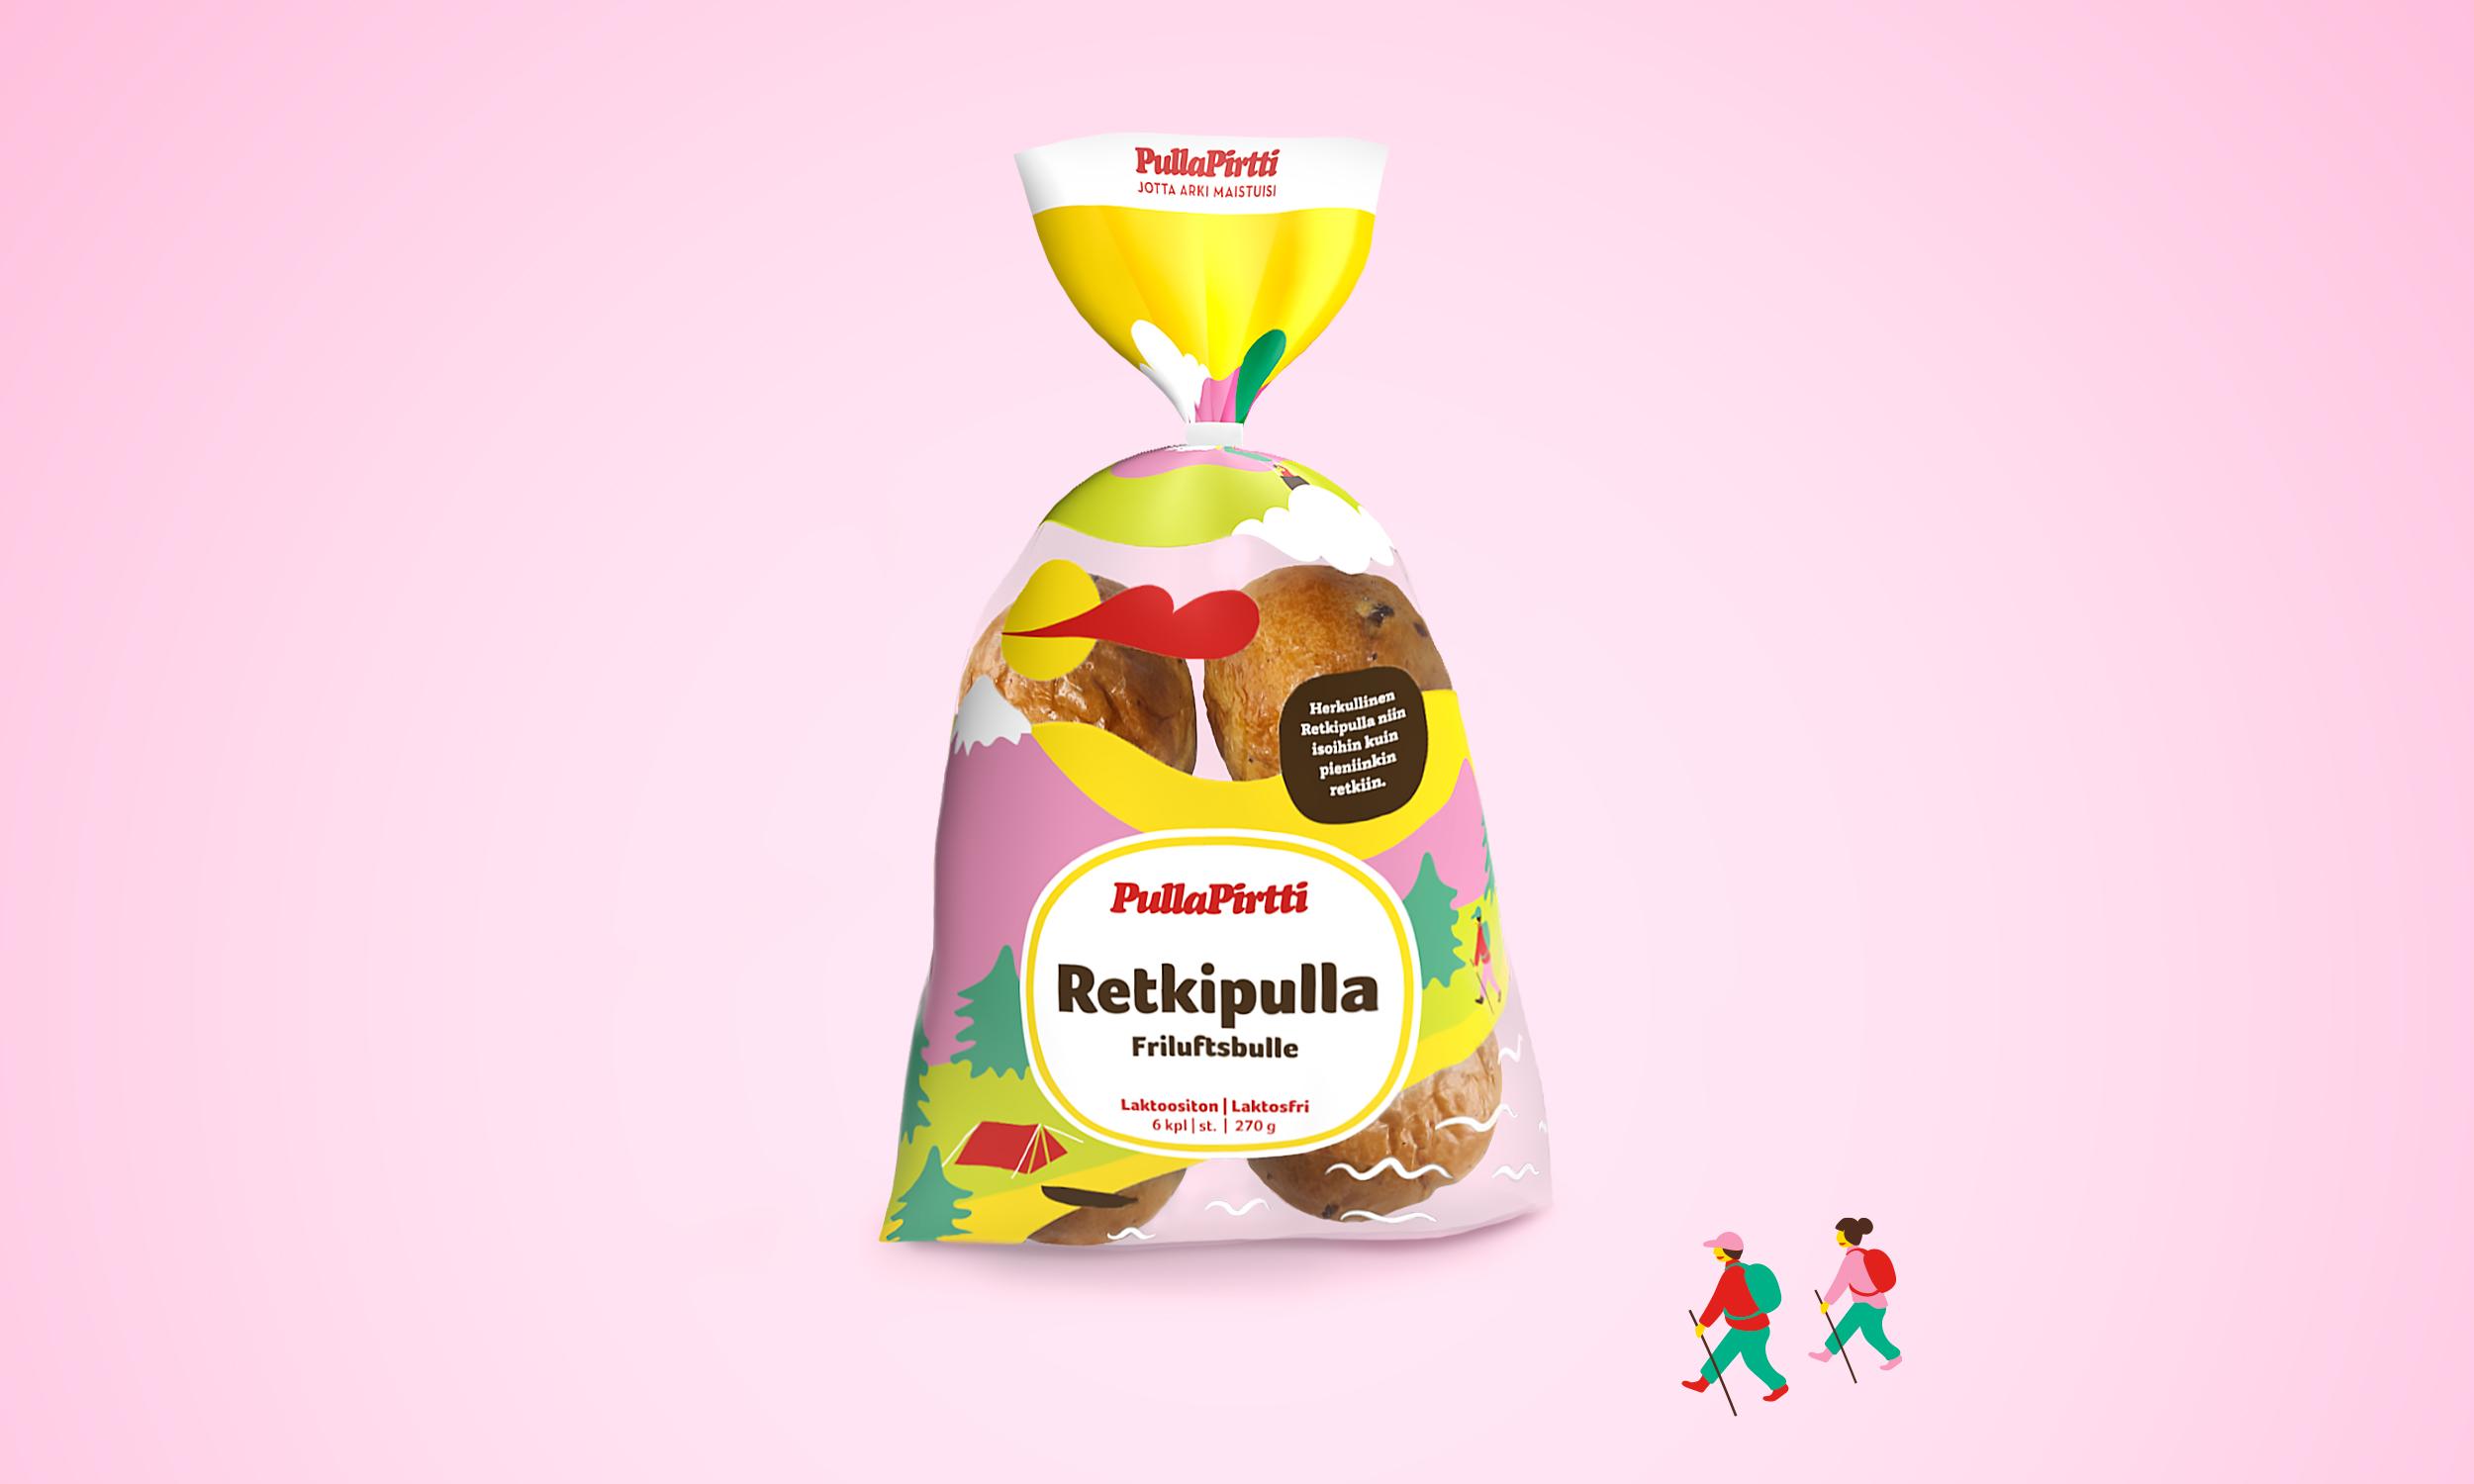 Retkipulla Raisin Bun Packaging Design for Pulla-Pirtti by Mint Station